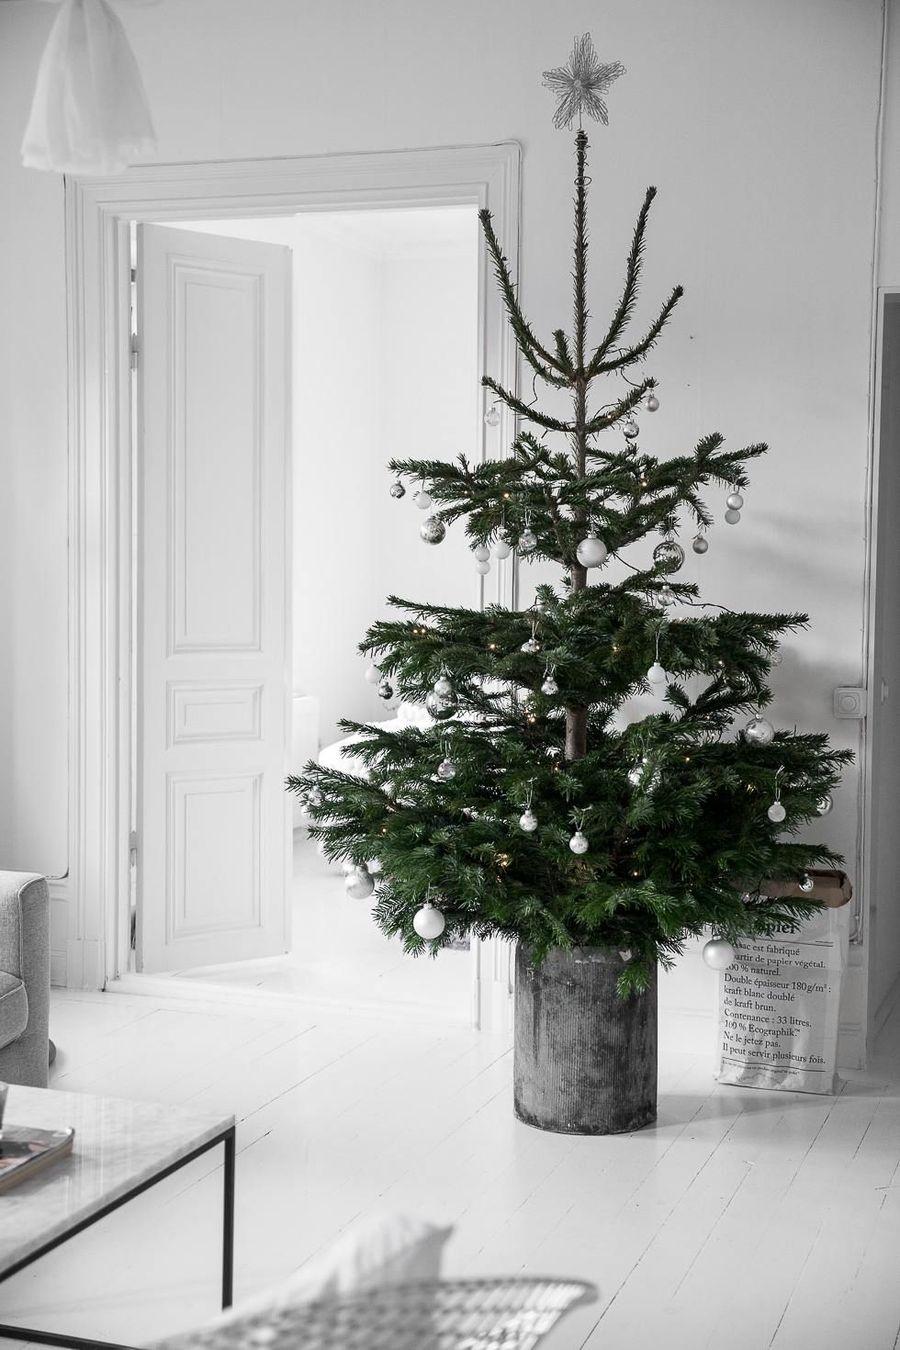 Scandi Christmas Tree in Galvanized Bucket via damernasvarld